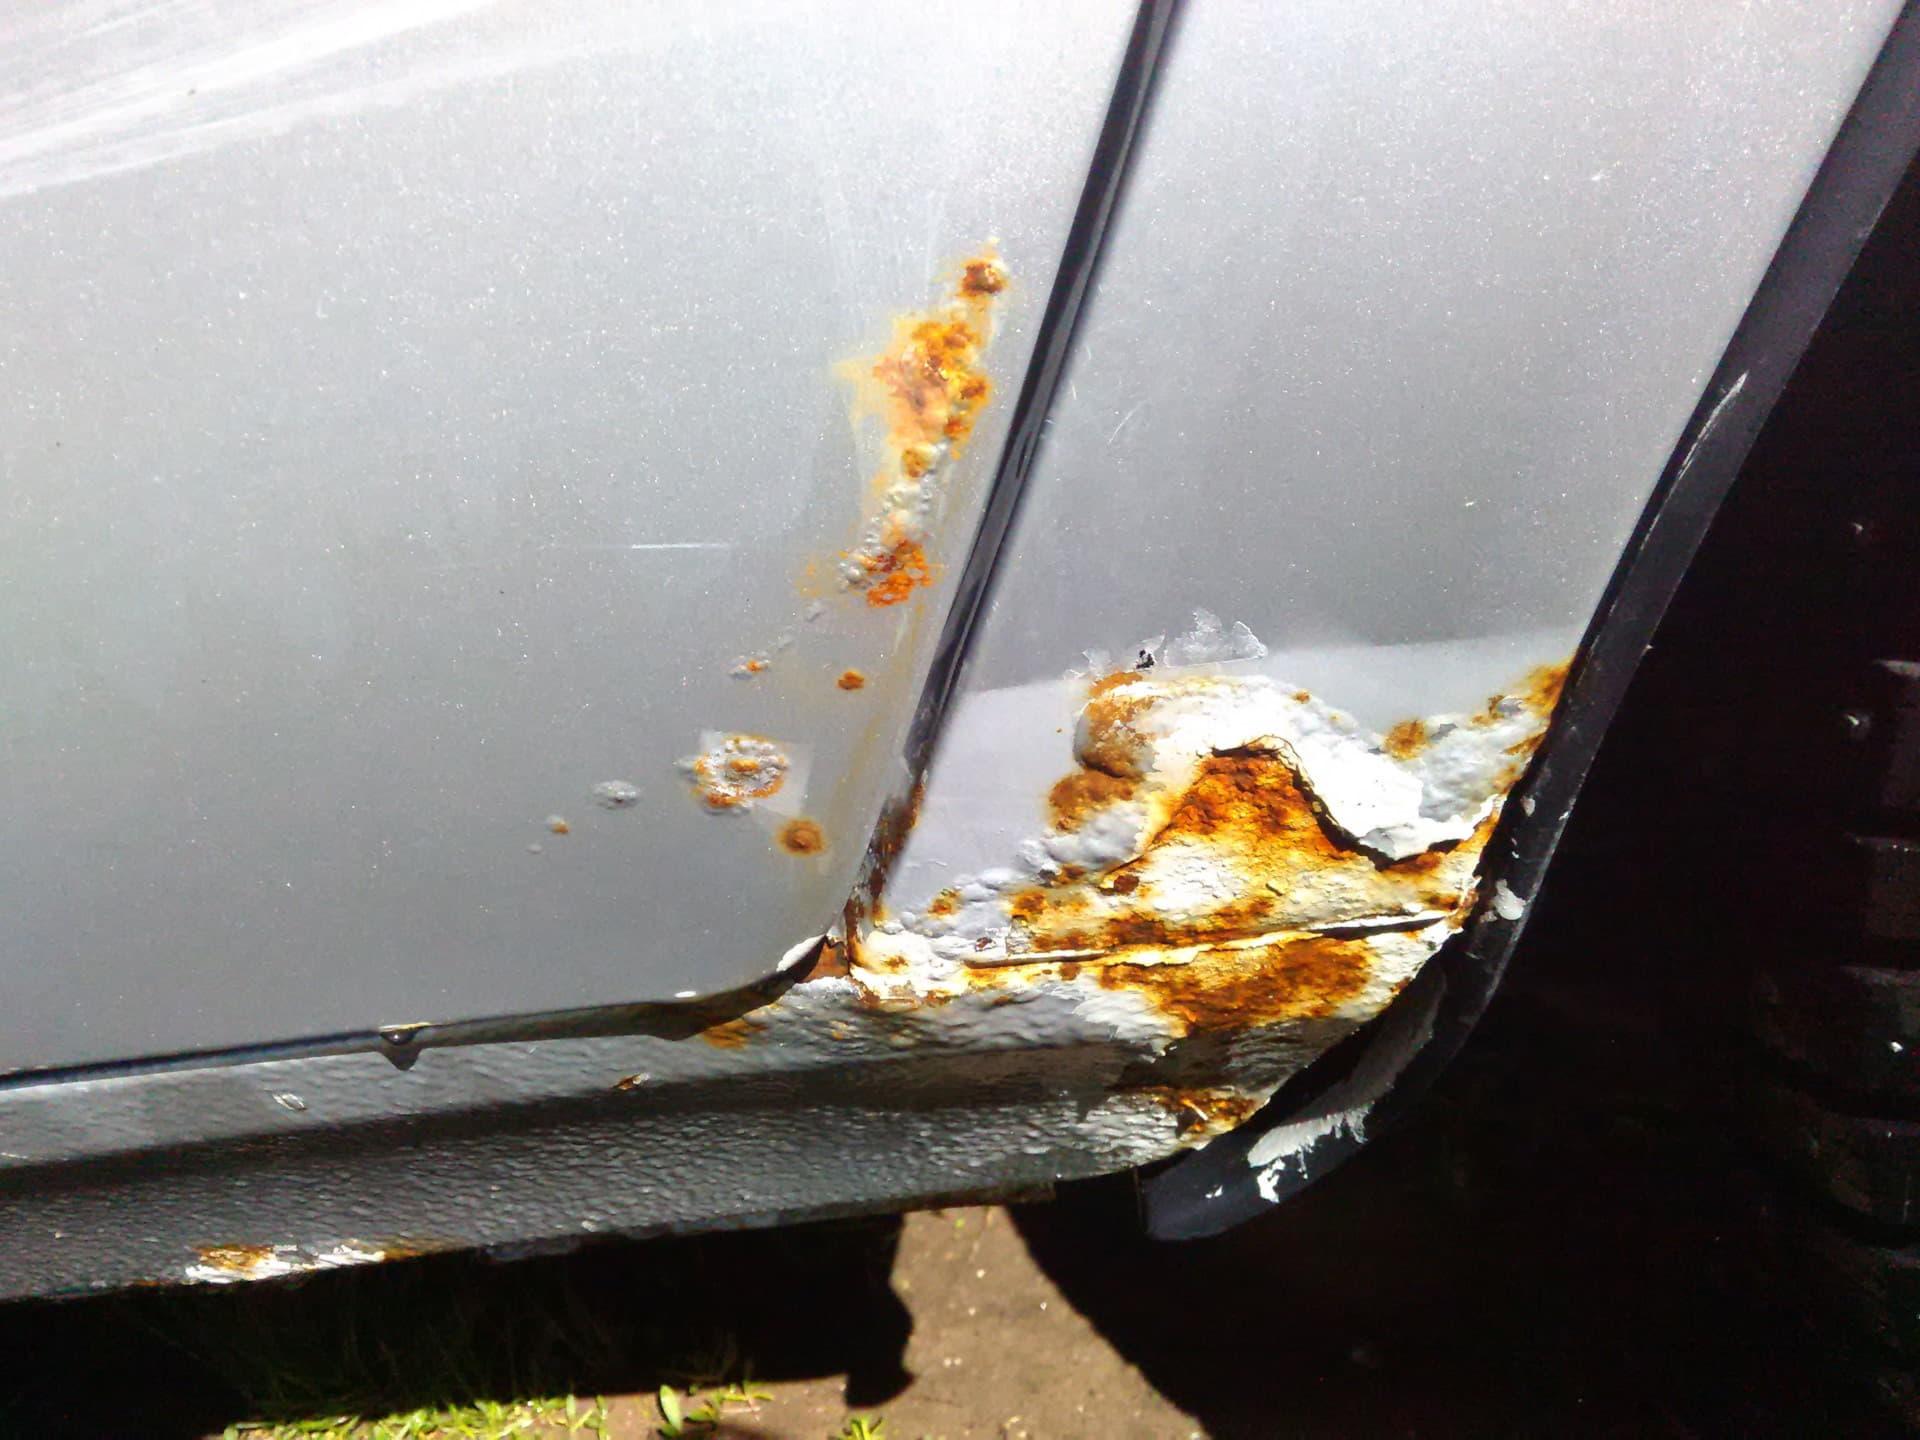 Коррозия авто: 2 способа устранить ржавчину без автосервиса